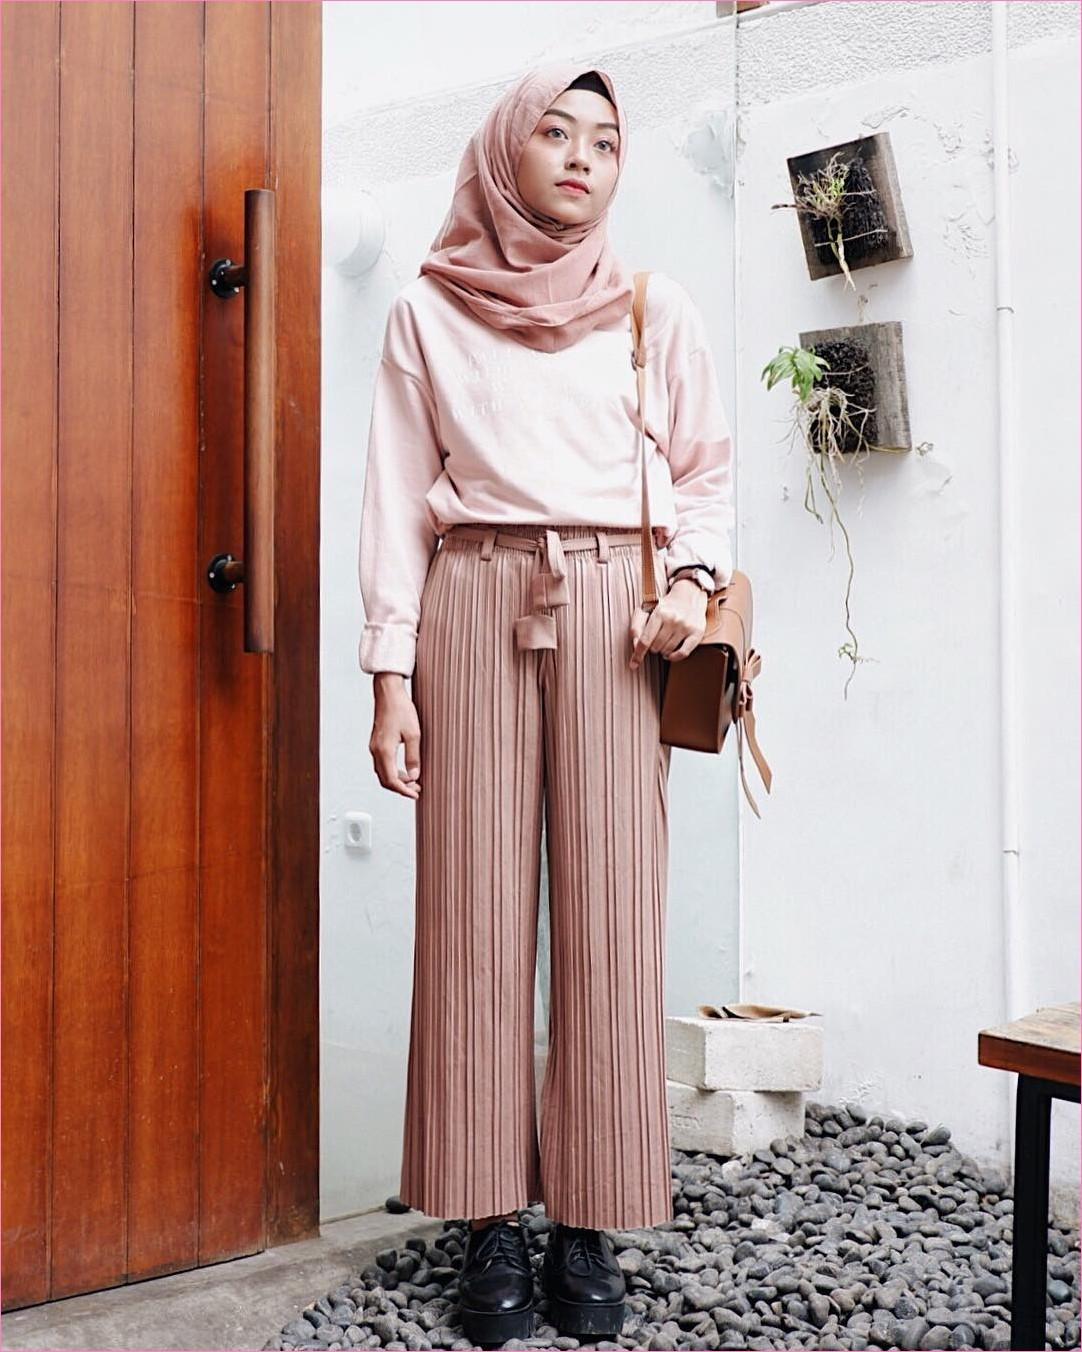 Outfit Celana Cullotes Untuk Hijabers Ala Selebgram 2018 hijab pashmina diamond top blouse kemeja sneakers lace ups hitam cullotes pallazo stripe hitam krem tua slingbags coklat ootd trendy jam tangan